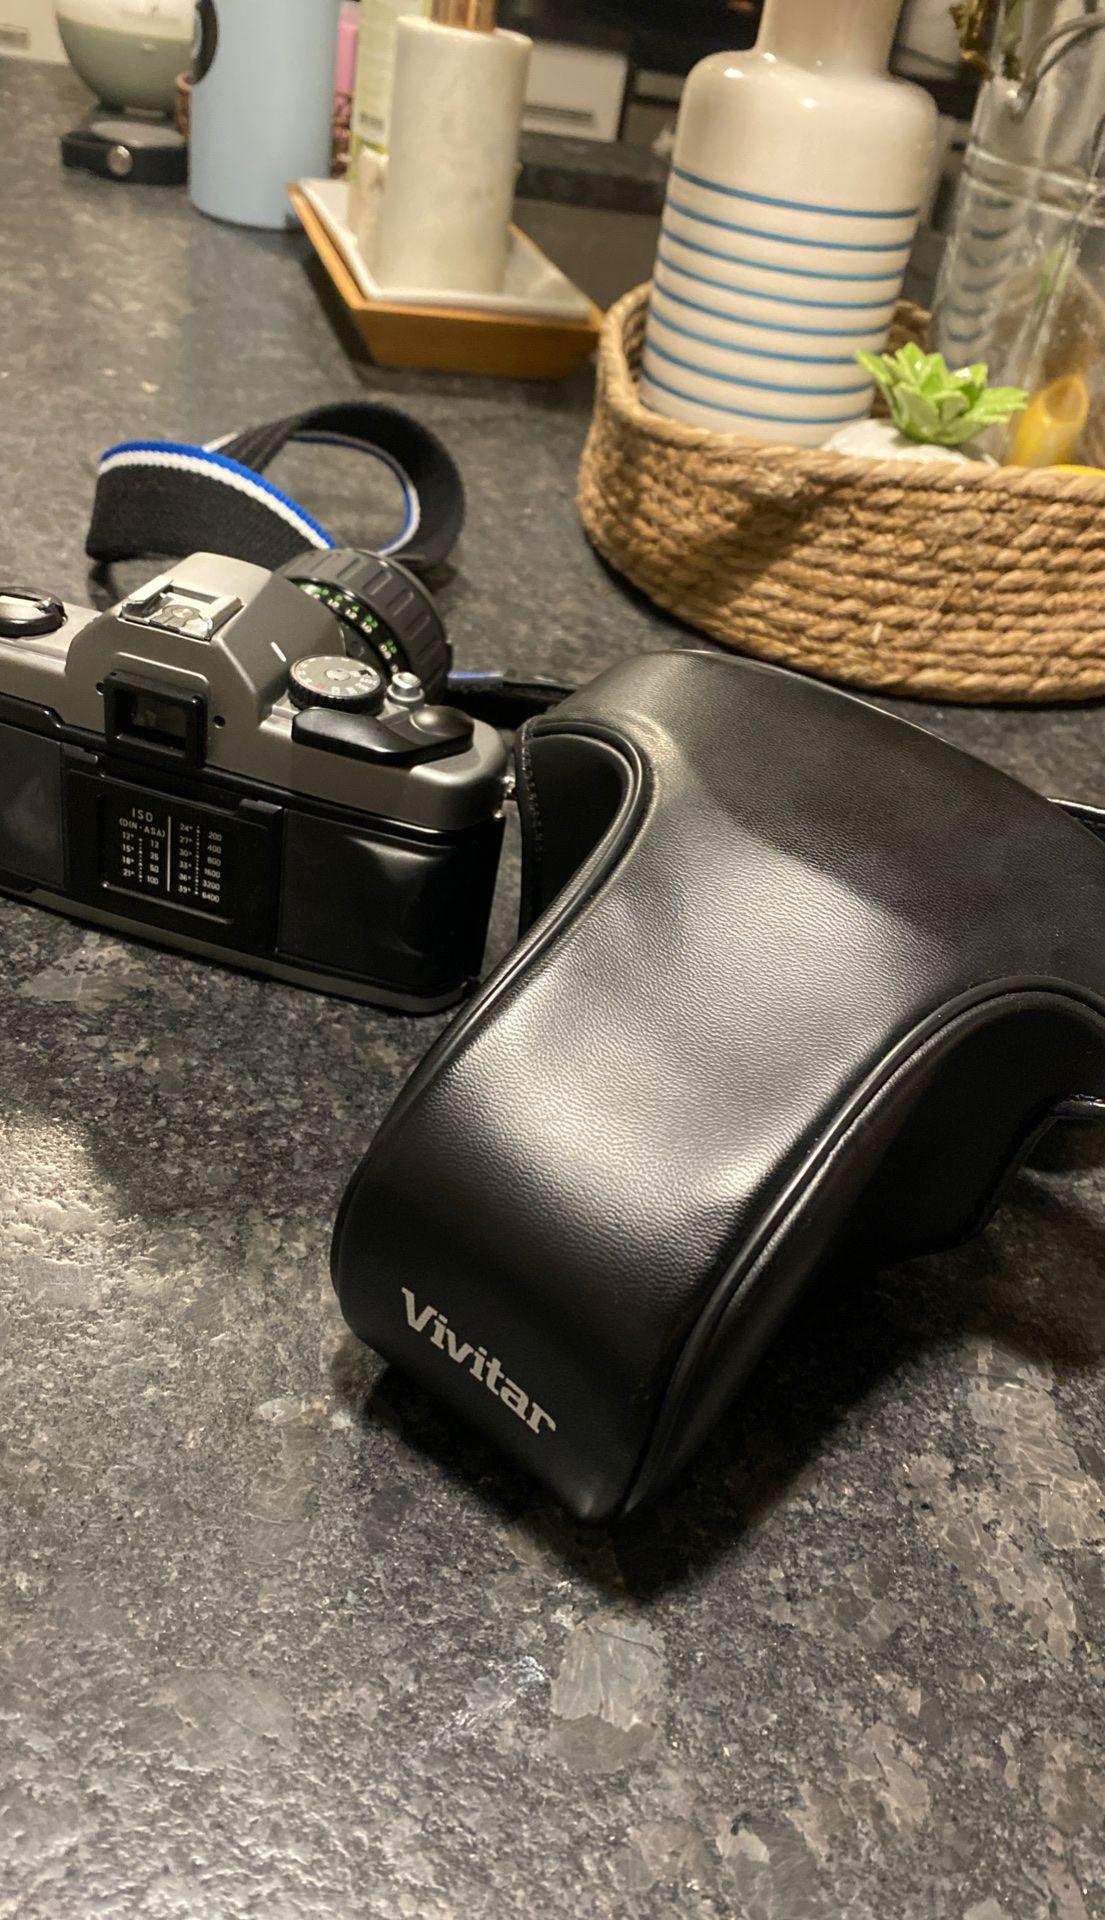 Vivitar Film Camera